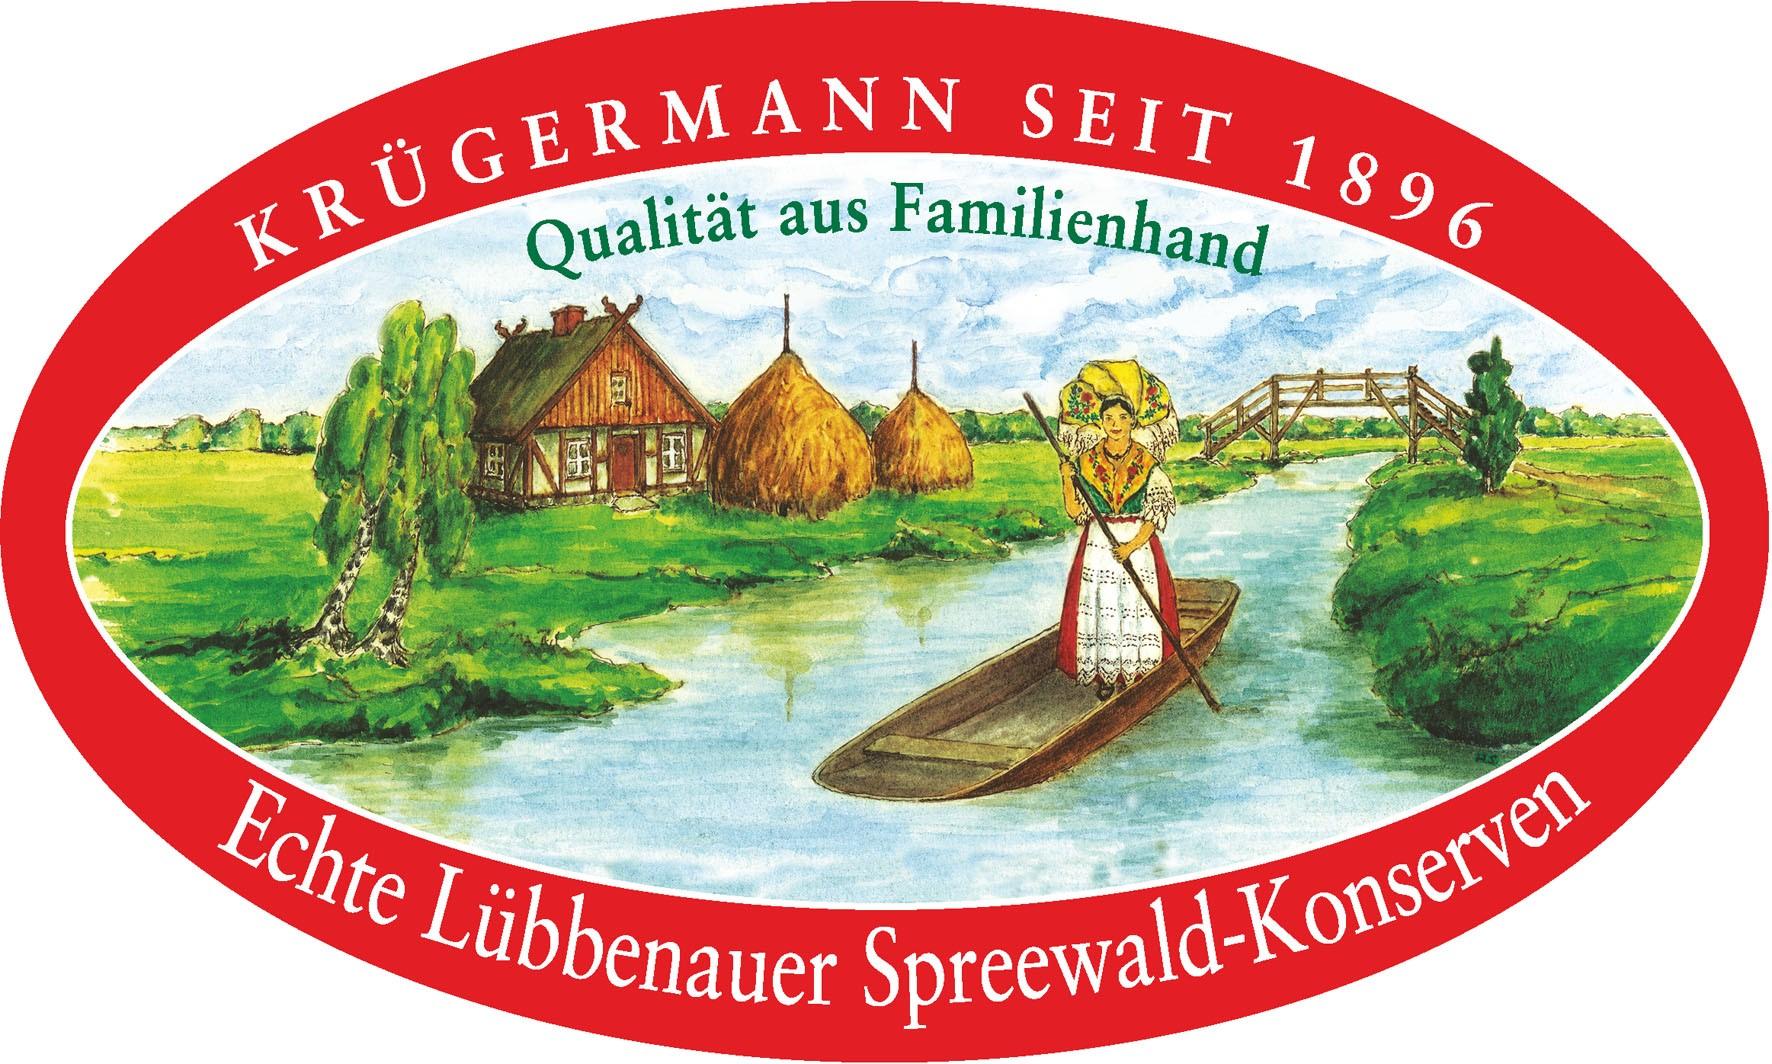 Krügermann GmbH